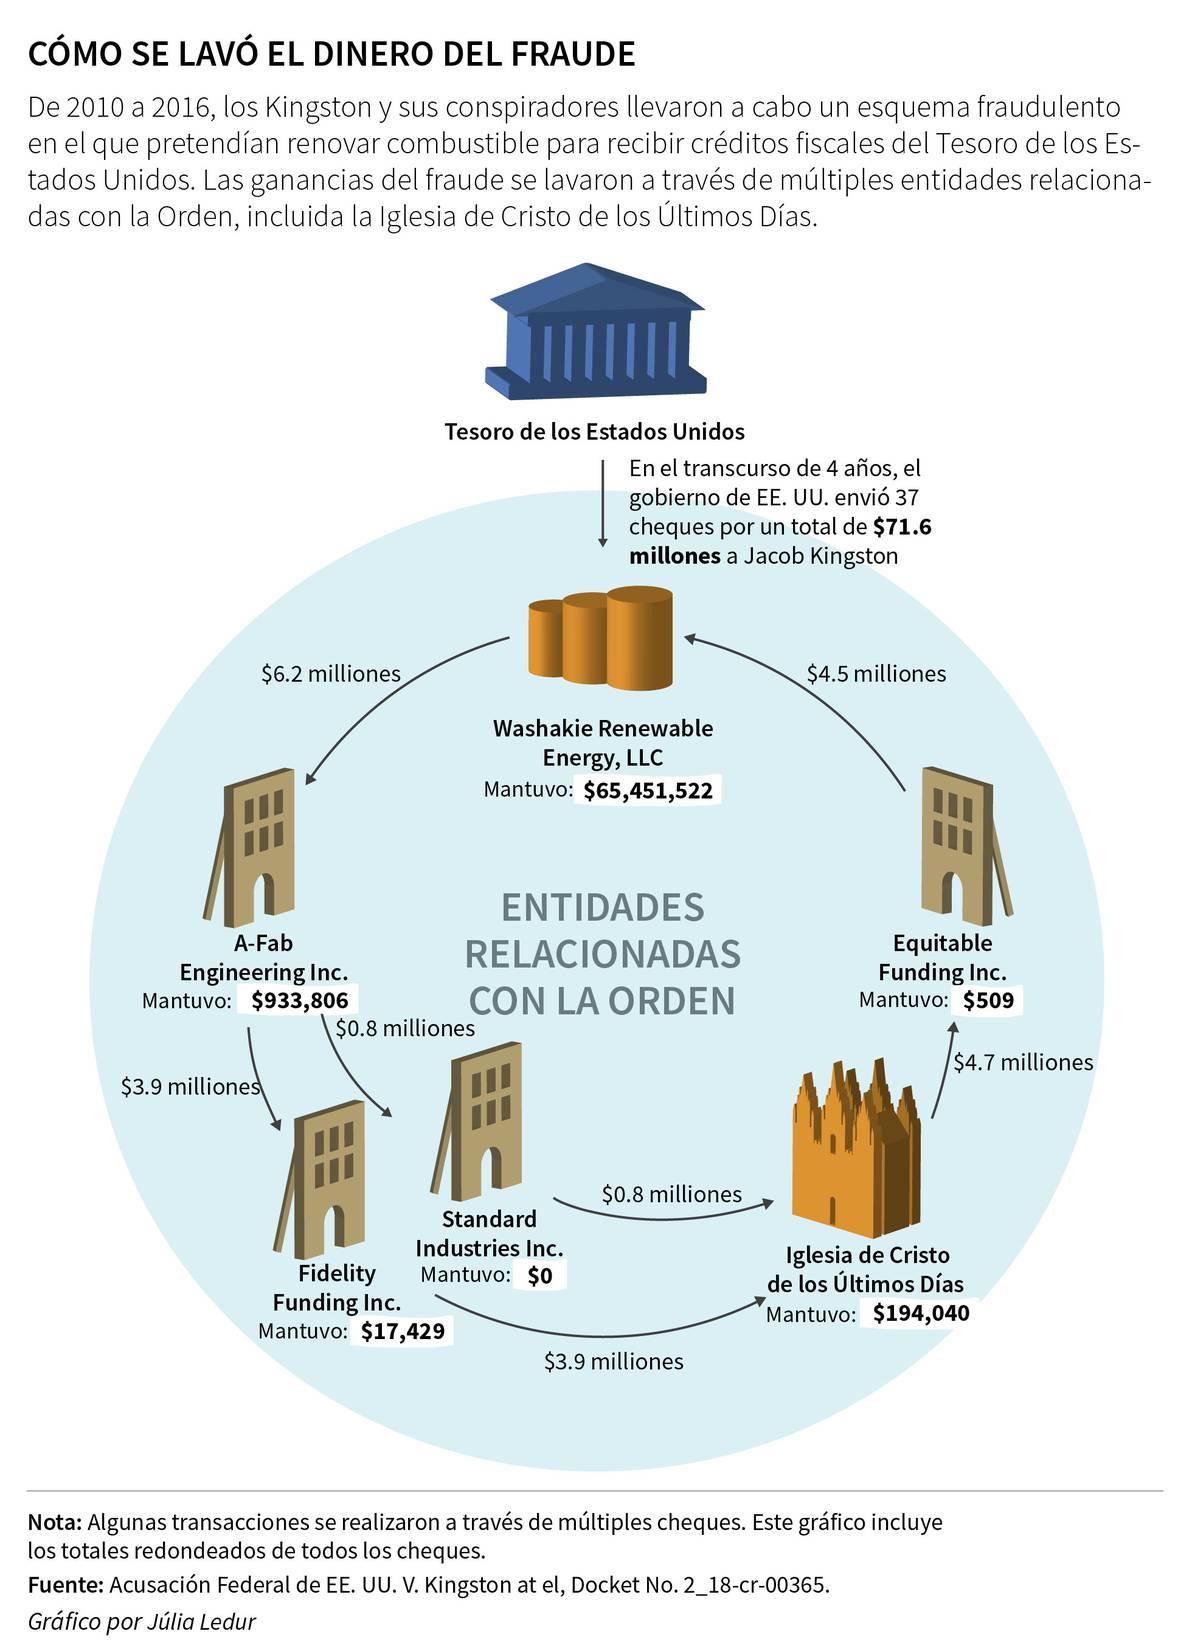 https://ladiaria.com.uy/media/photologue/photos/cache/money-flow-diagram-es_1192w.jpg